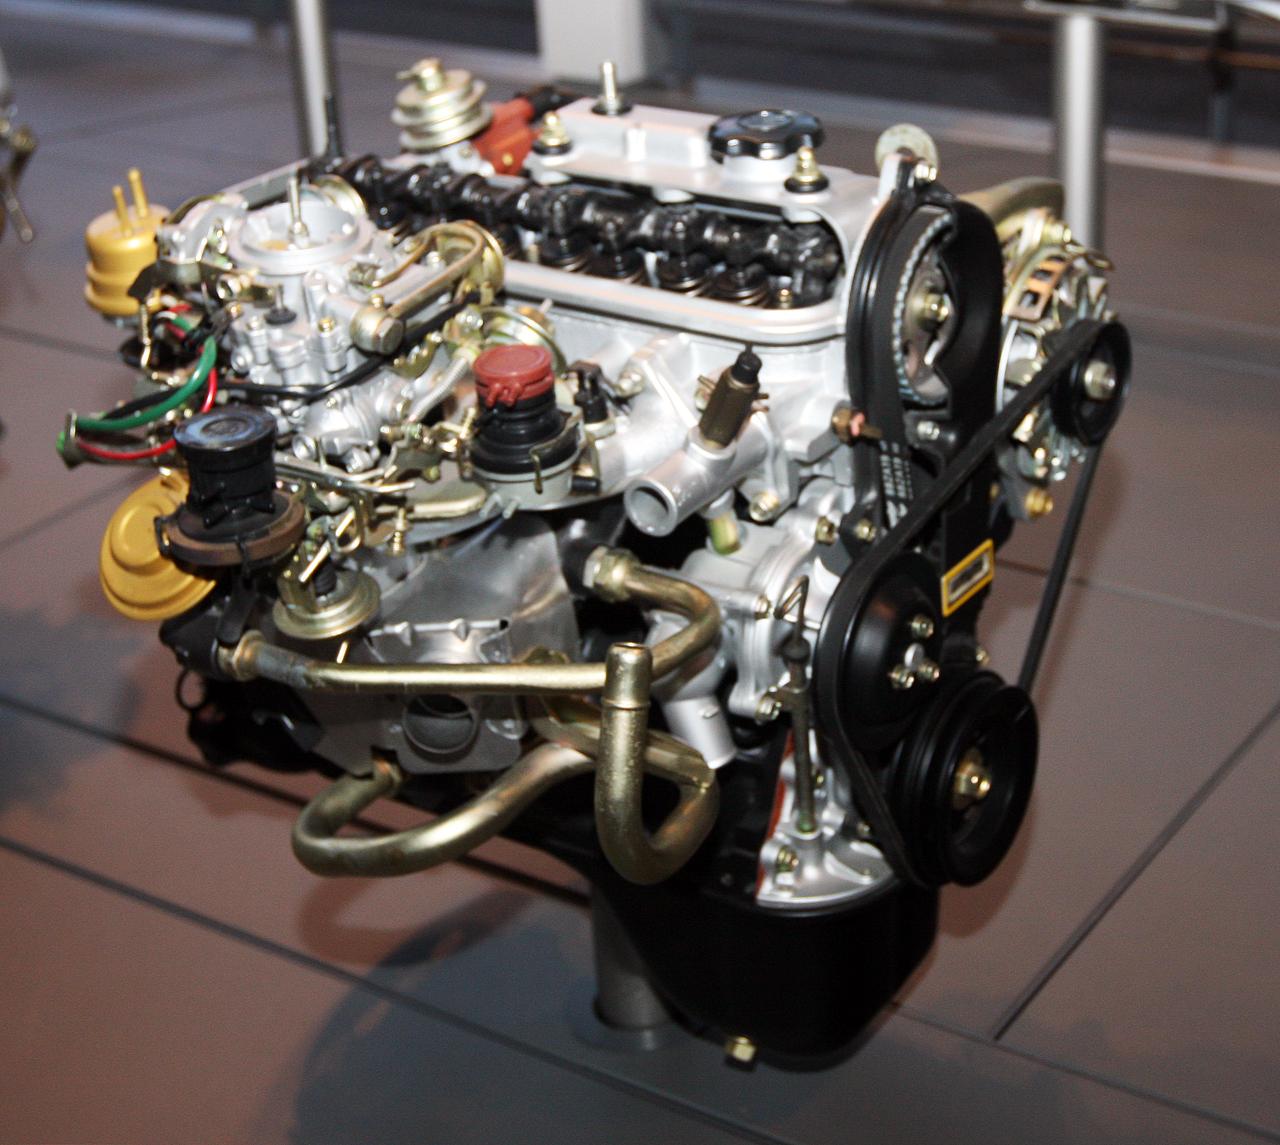 Best Car Exhaust